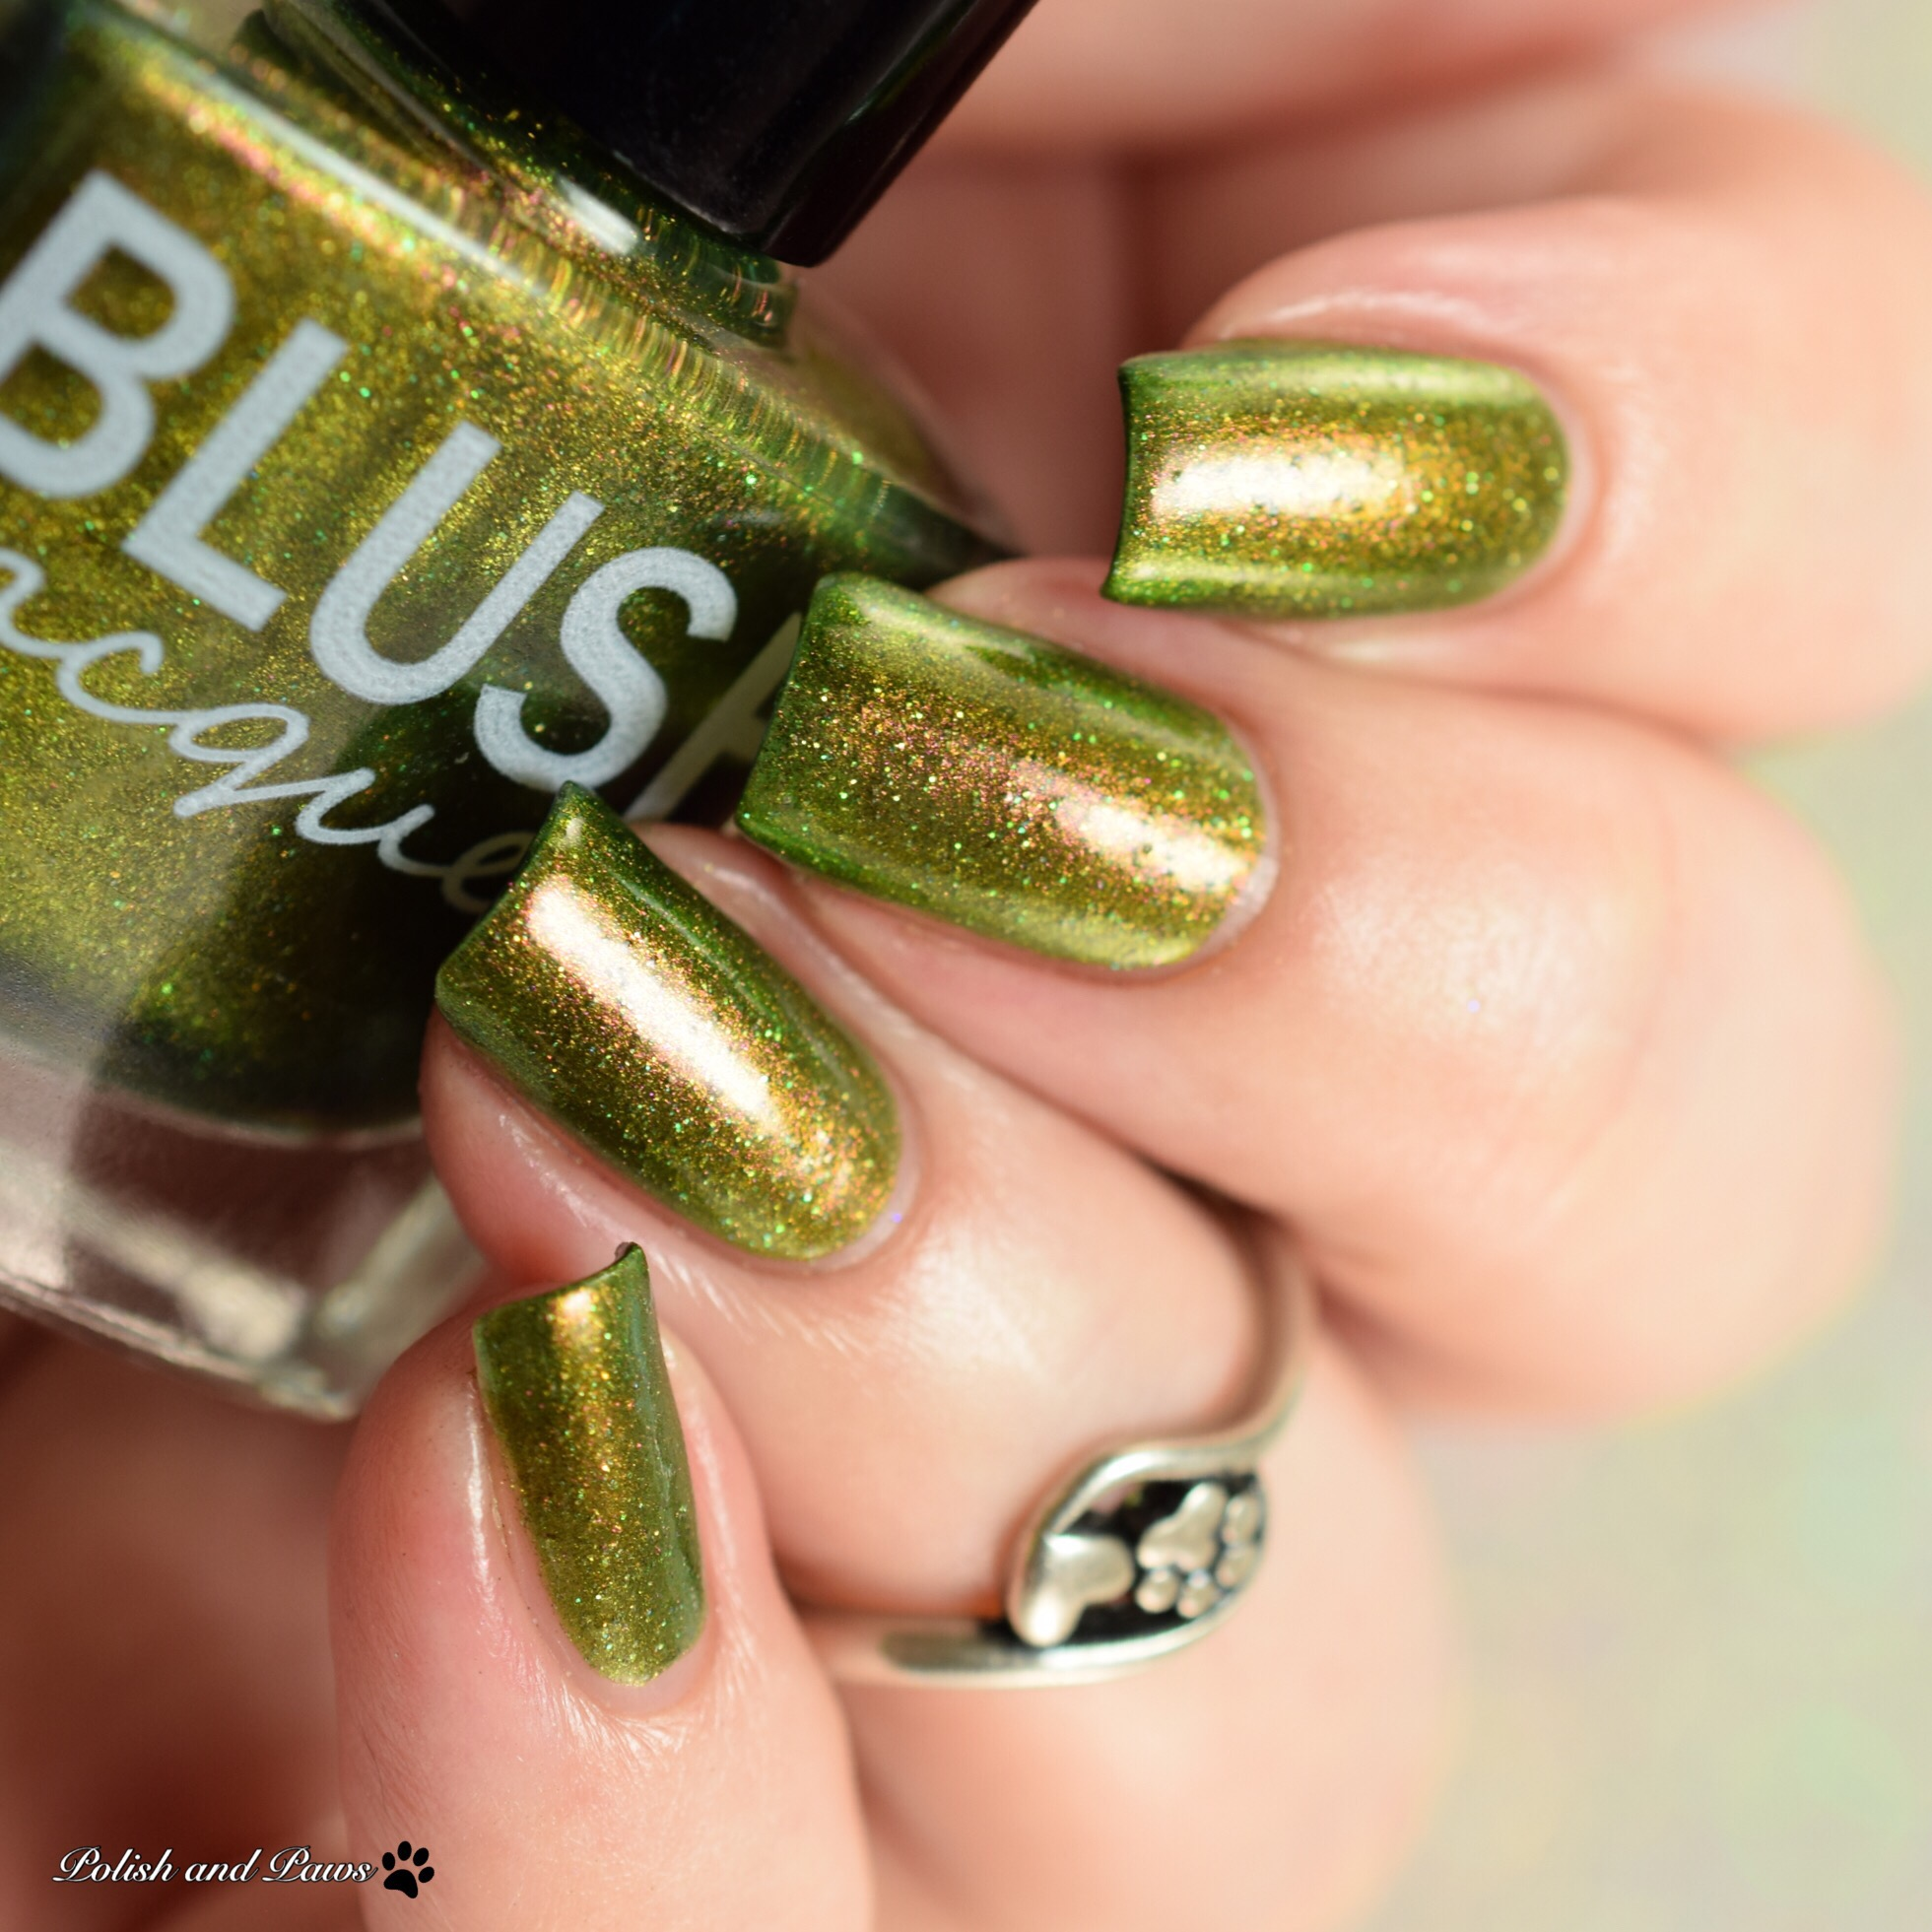 Blush Lacquers Candelabra-cadabra